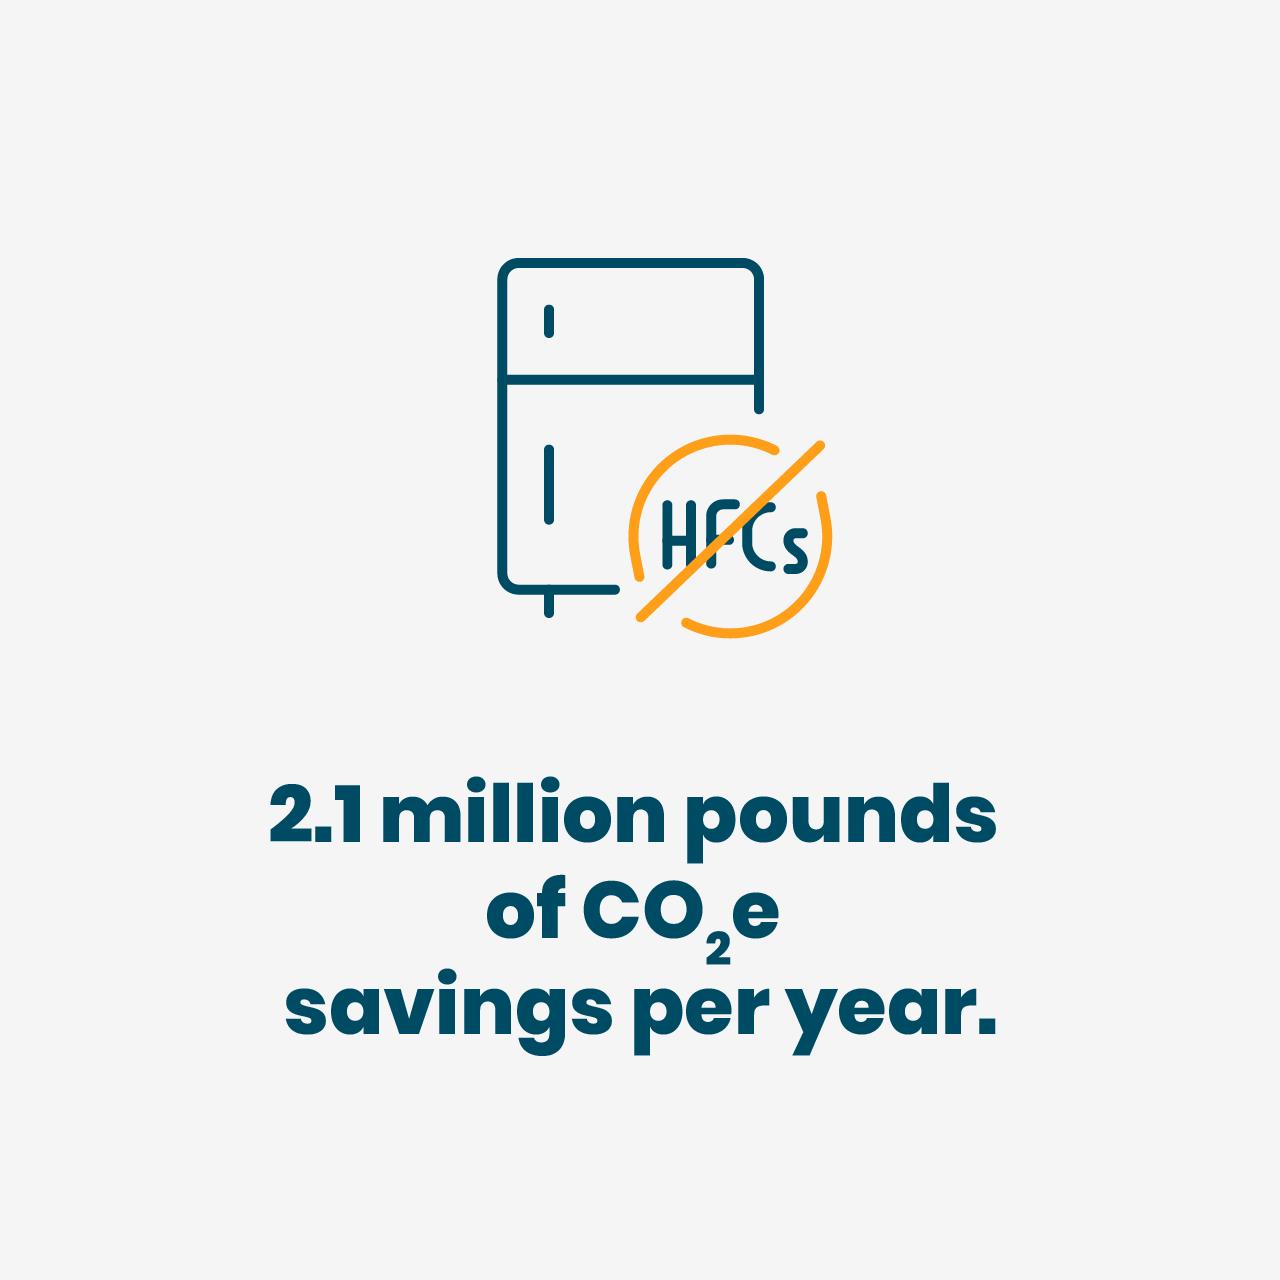 2.1 million pounds of CO2e savings per year